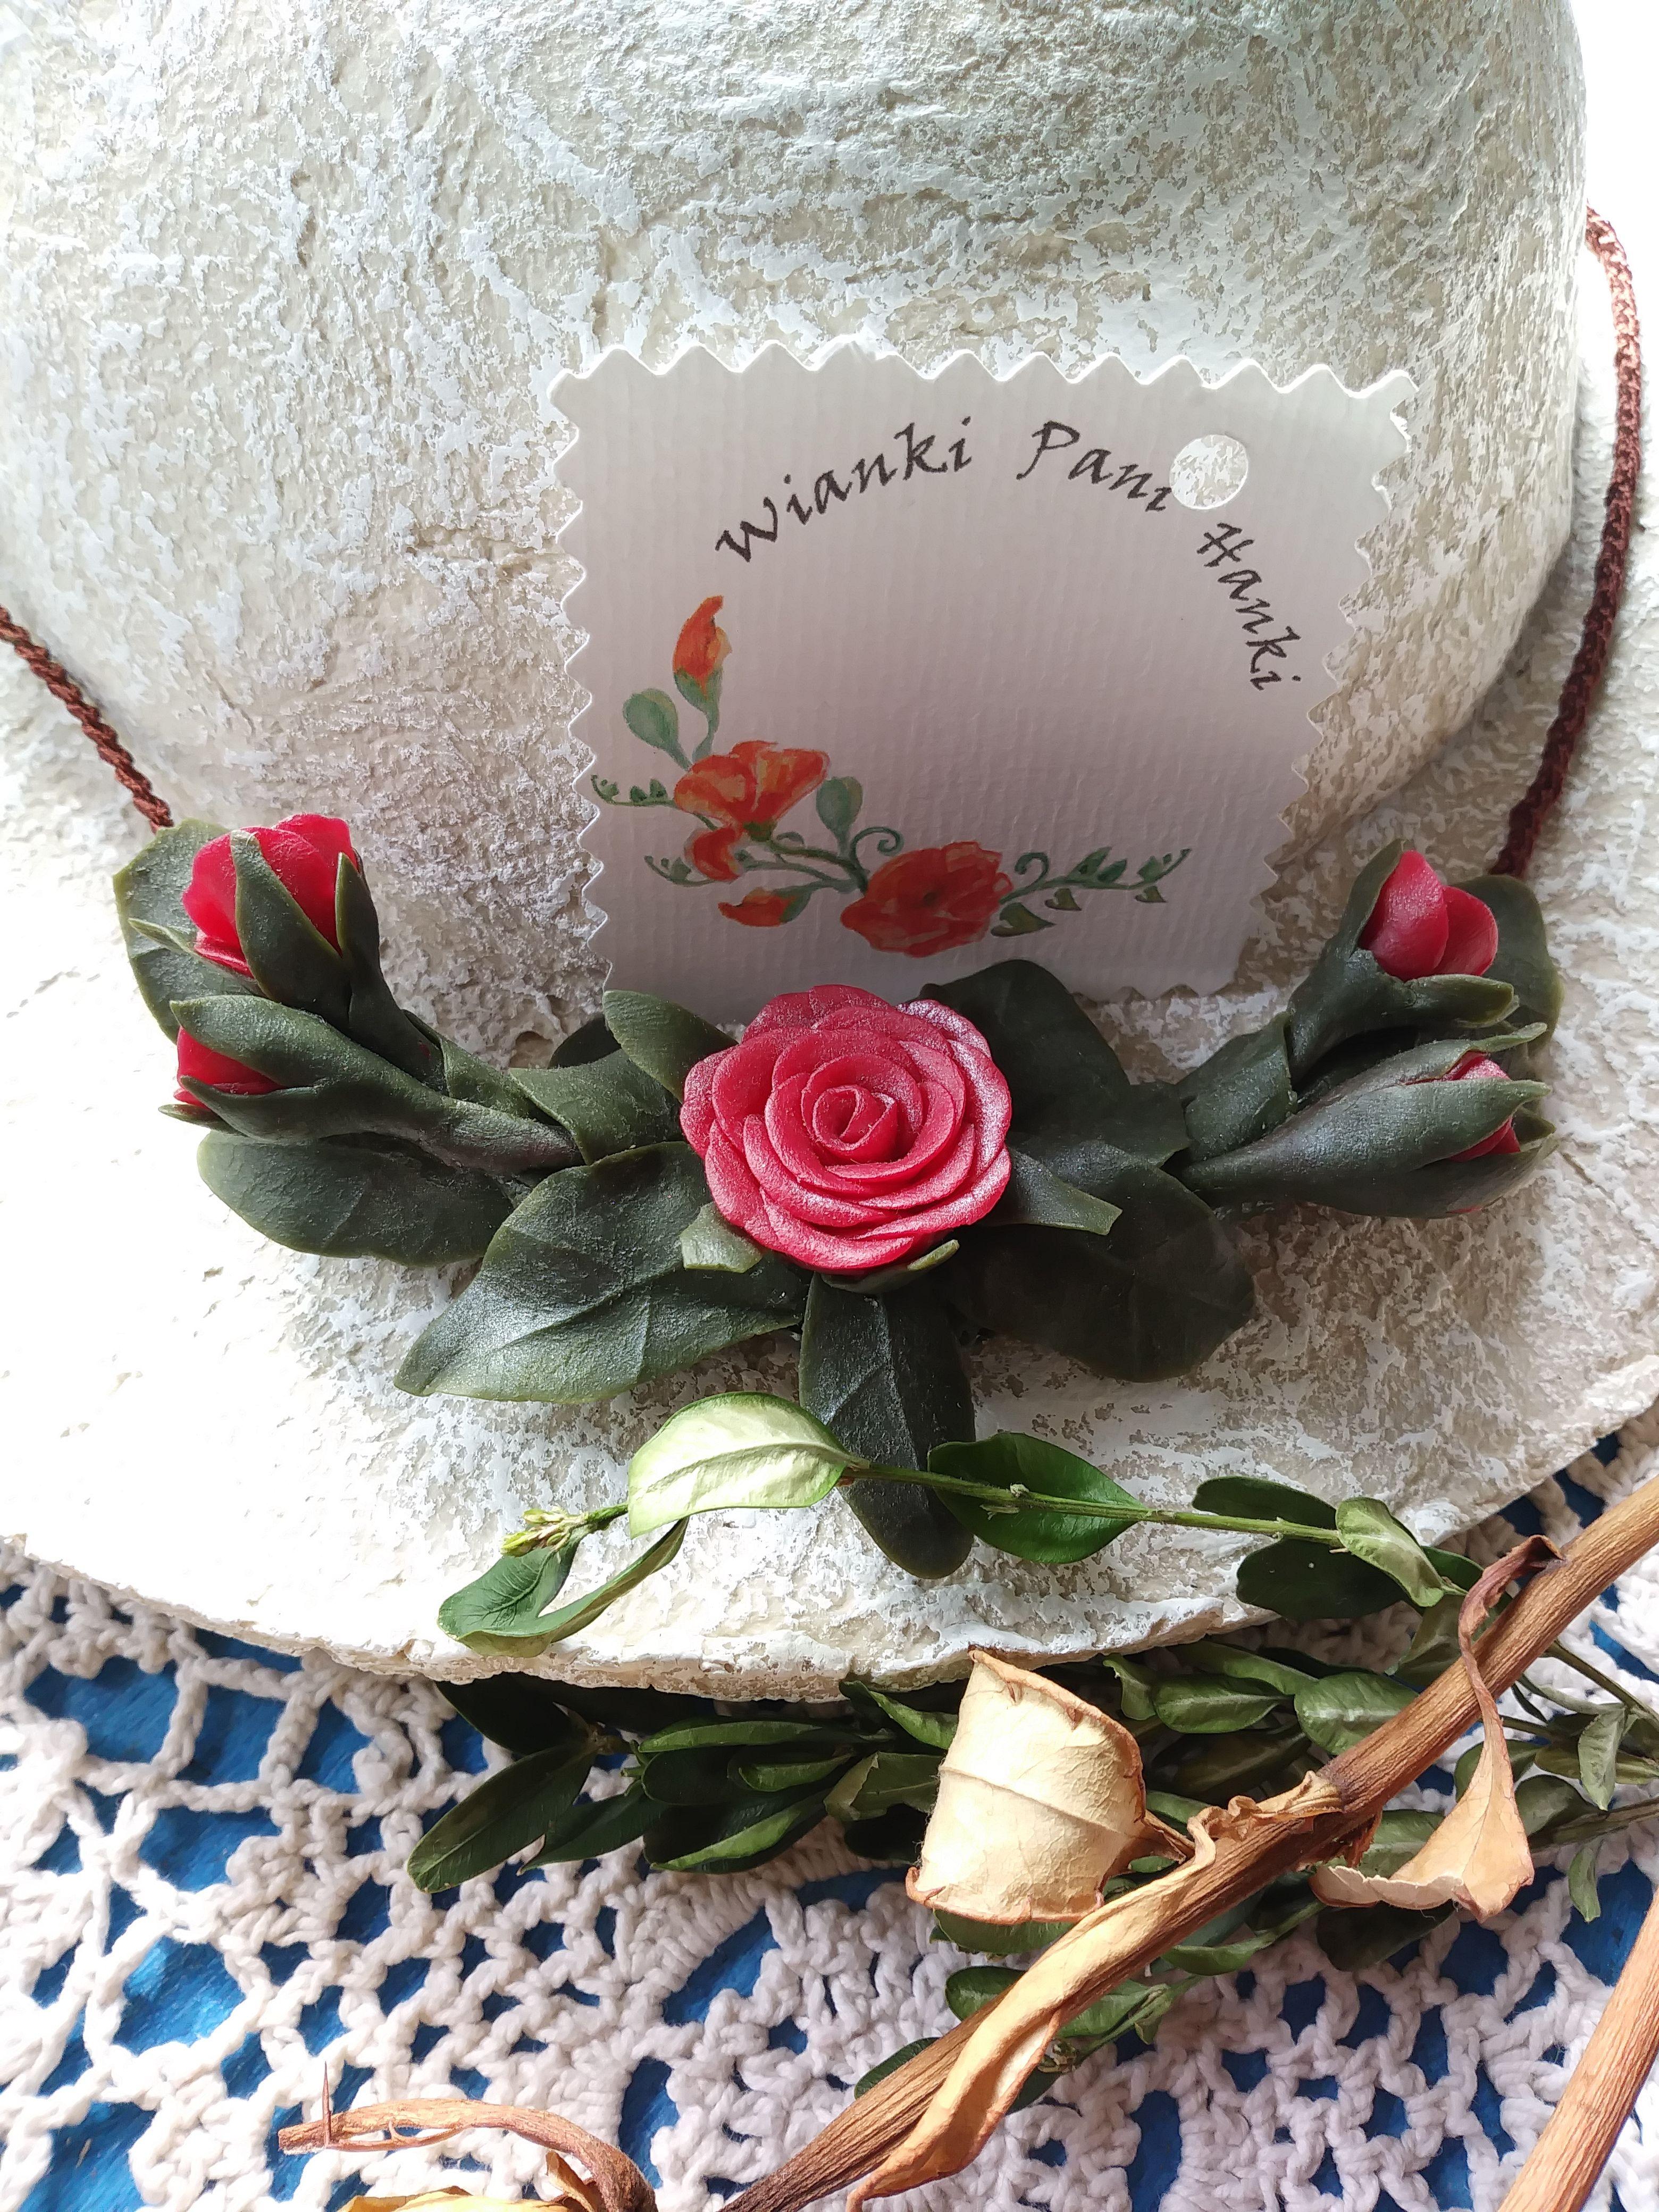 Necklace Naszyjnik Cold Porcelain Zimna Porcelana Cold Porcelain Facebook Sign Up Porcelain